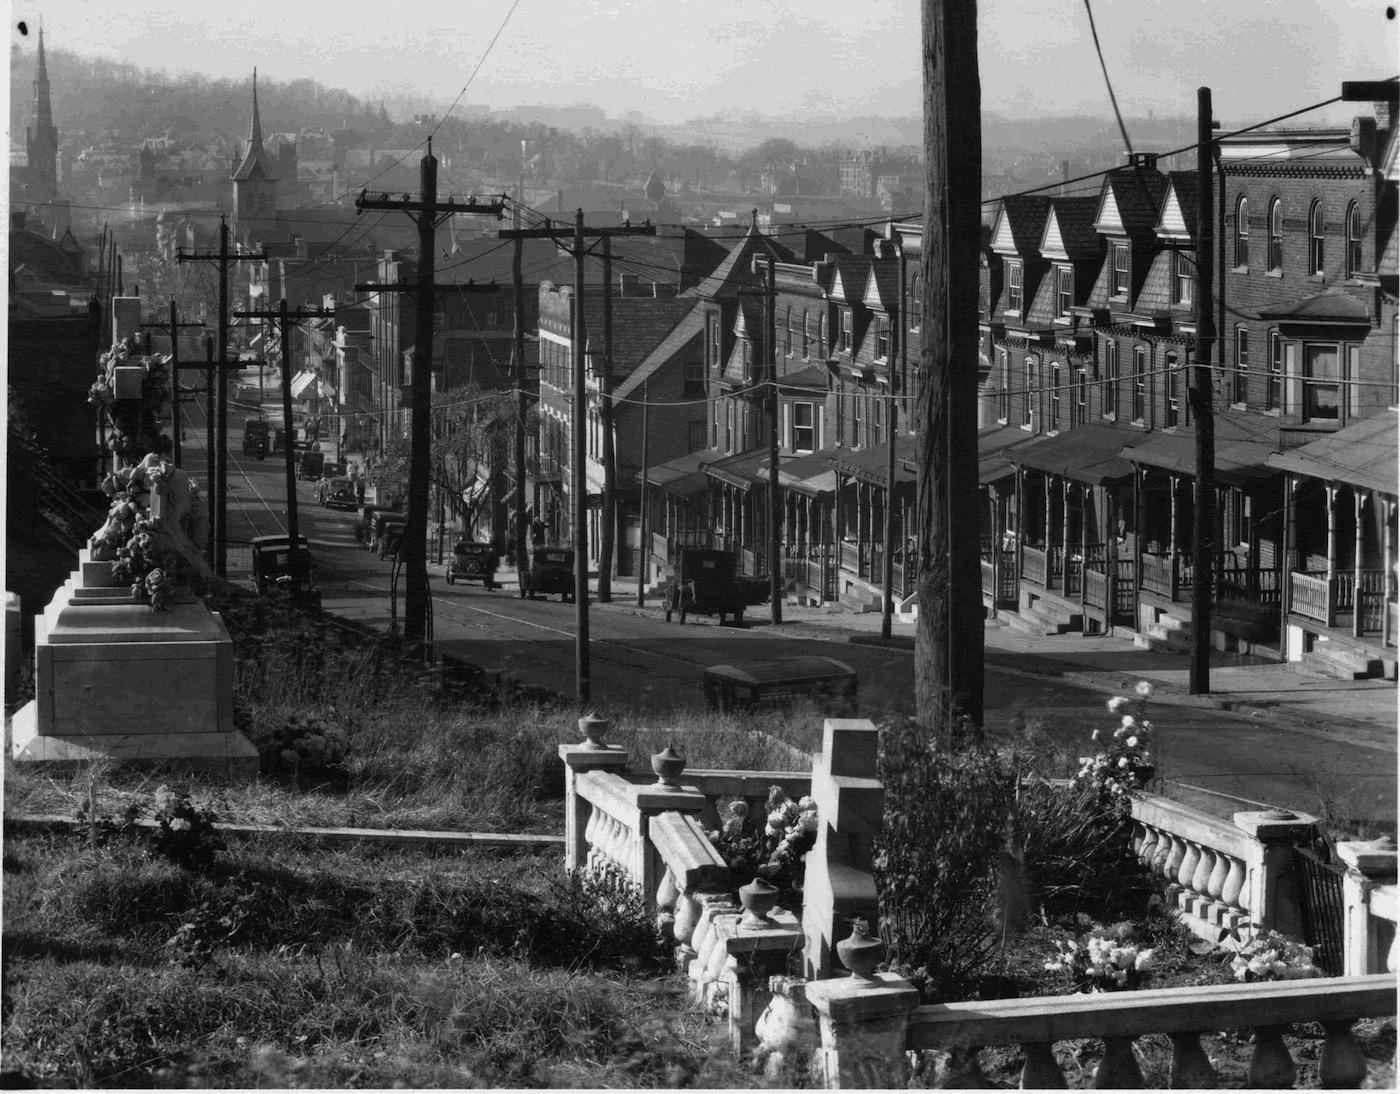 Walker Evans Street in Bethlehem, Penn. Data: 1935 Data stampa: 1972 CSAC, Università di Parma, Sezione Fotografia © Walker Evans Archive, The Metropolitan Museum of Art, New York.